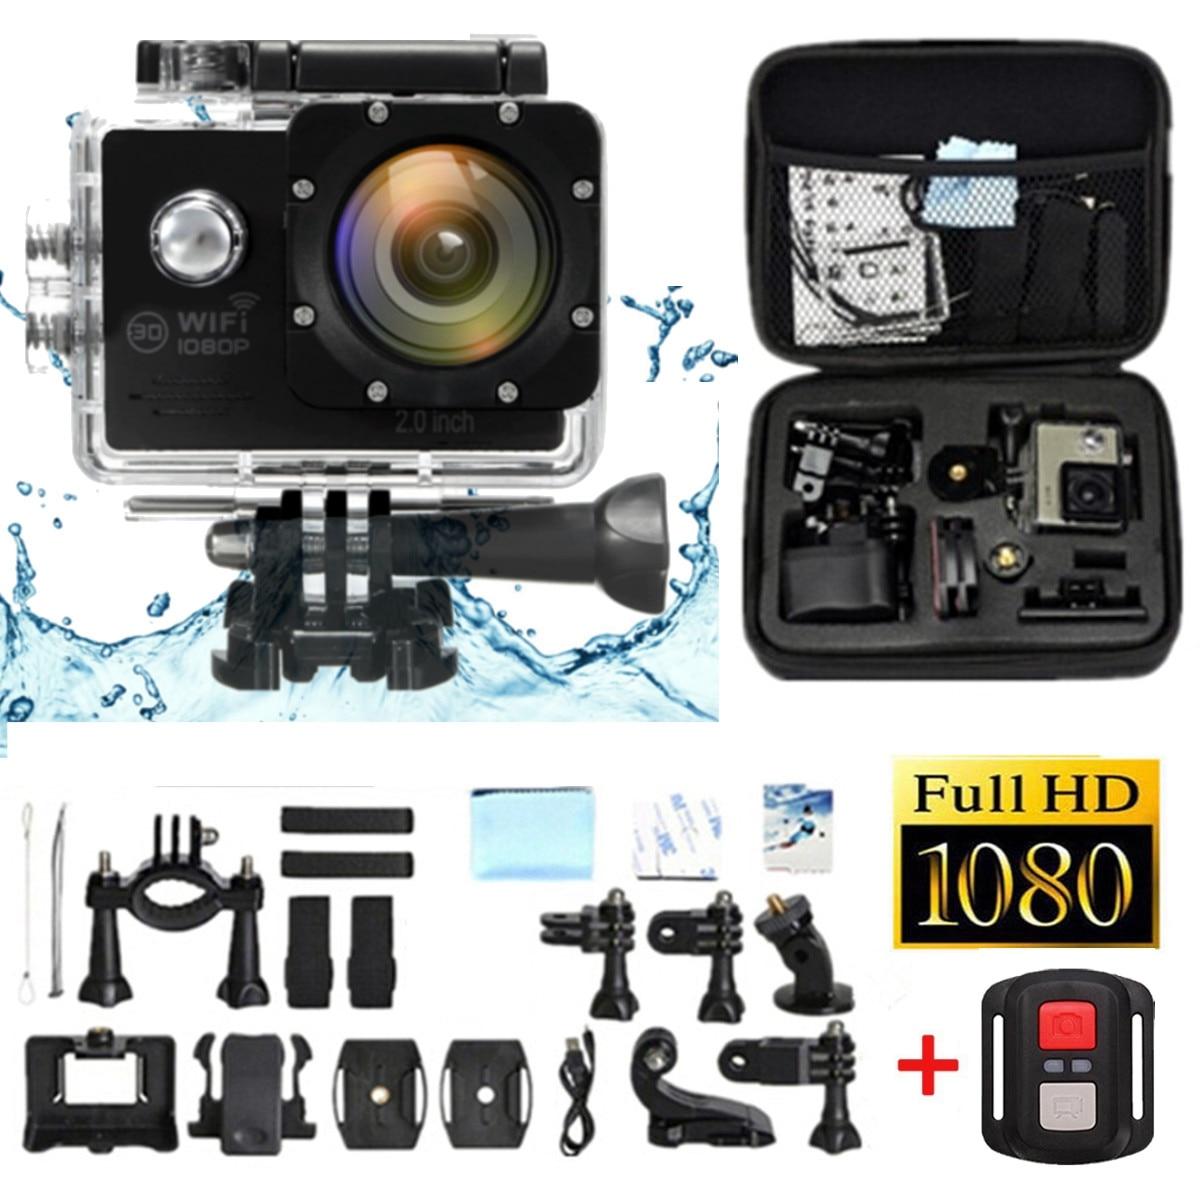 4K 2.0 LCD HD 1080P 16MP Waterproof Wifi Sport Action Camera Cam DV Digital Camcorder Storage Case campark wifi sport action camera 2k hd 30fps hd 1 5 tft lcd 1080p 60 fps 16mp action cam digital camcorder hdmi output